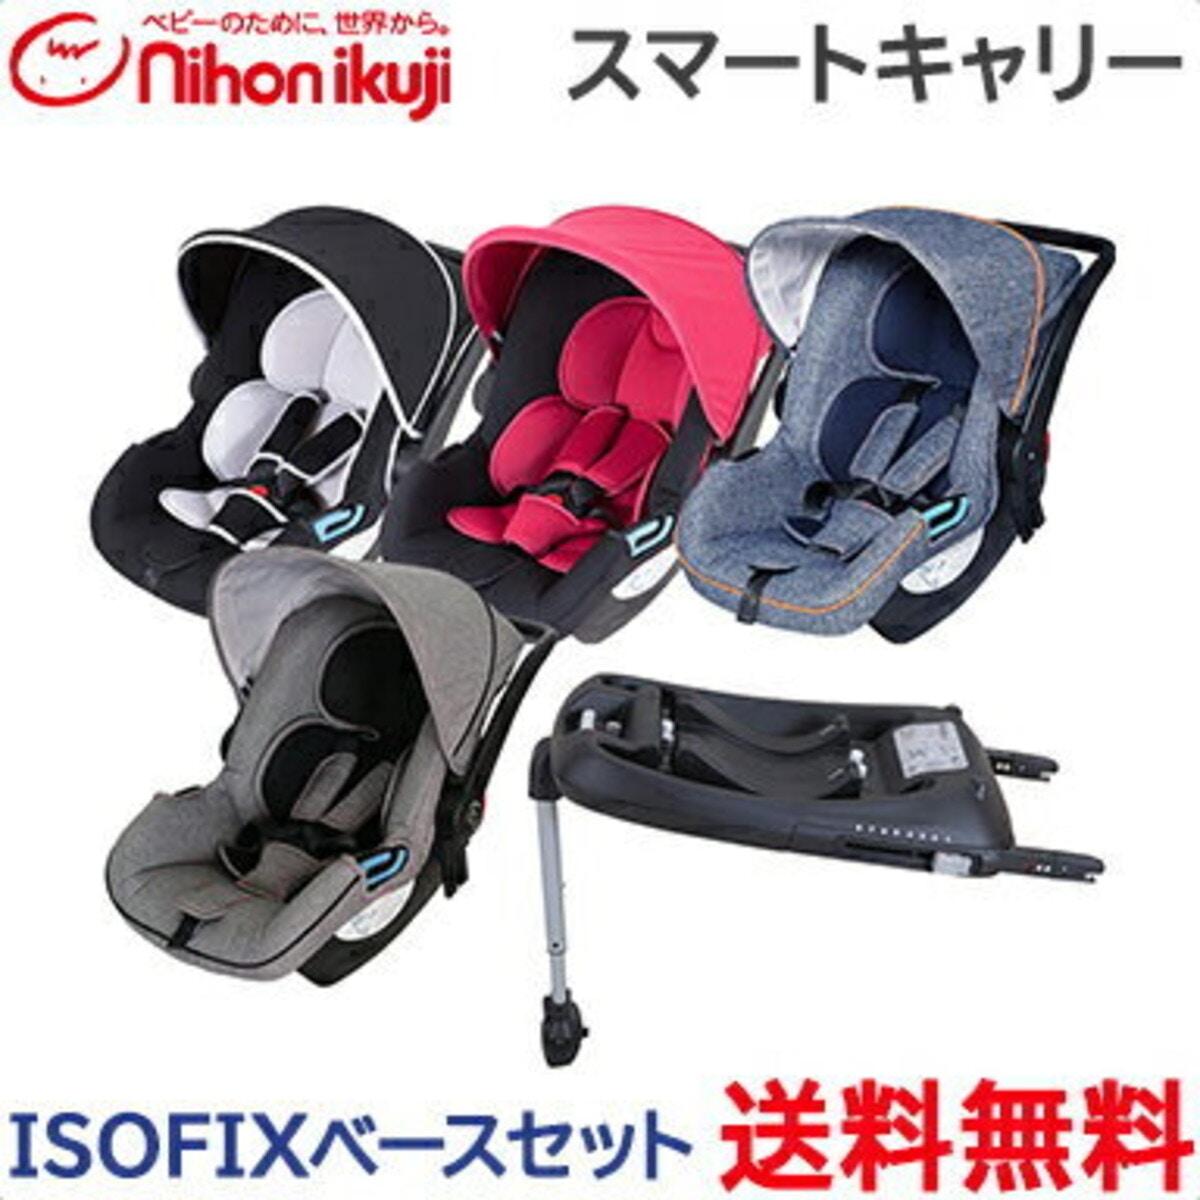 Nihon ikujiスマートキャリー ISOFIXベースセット